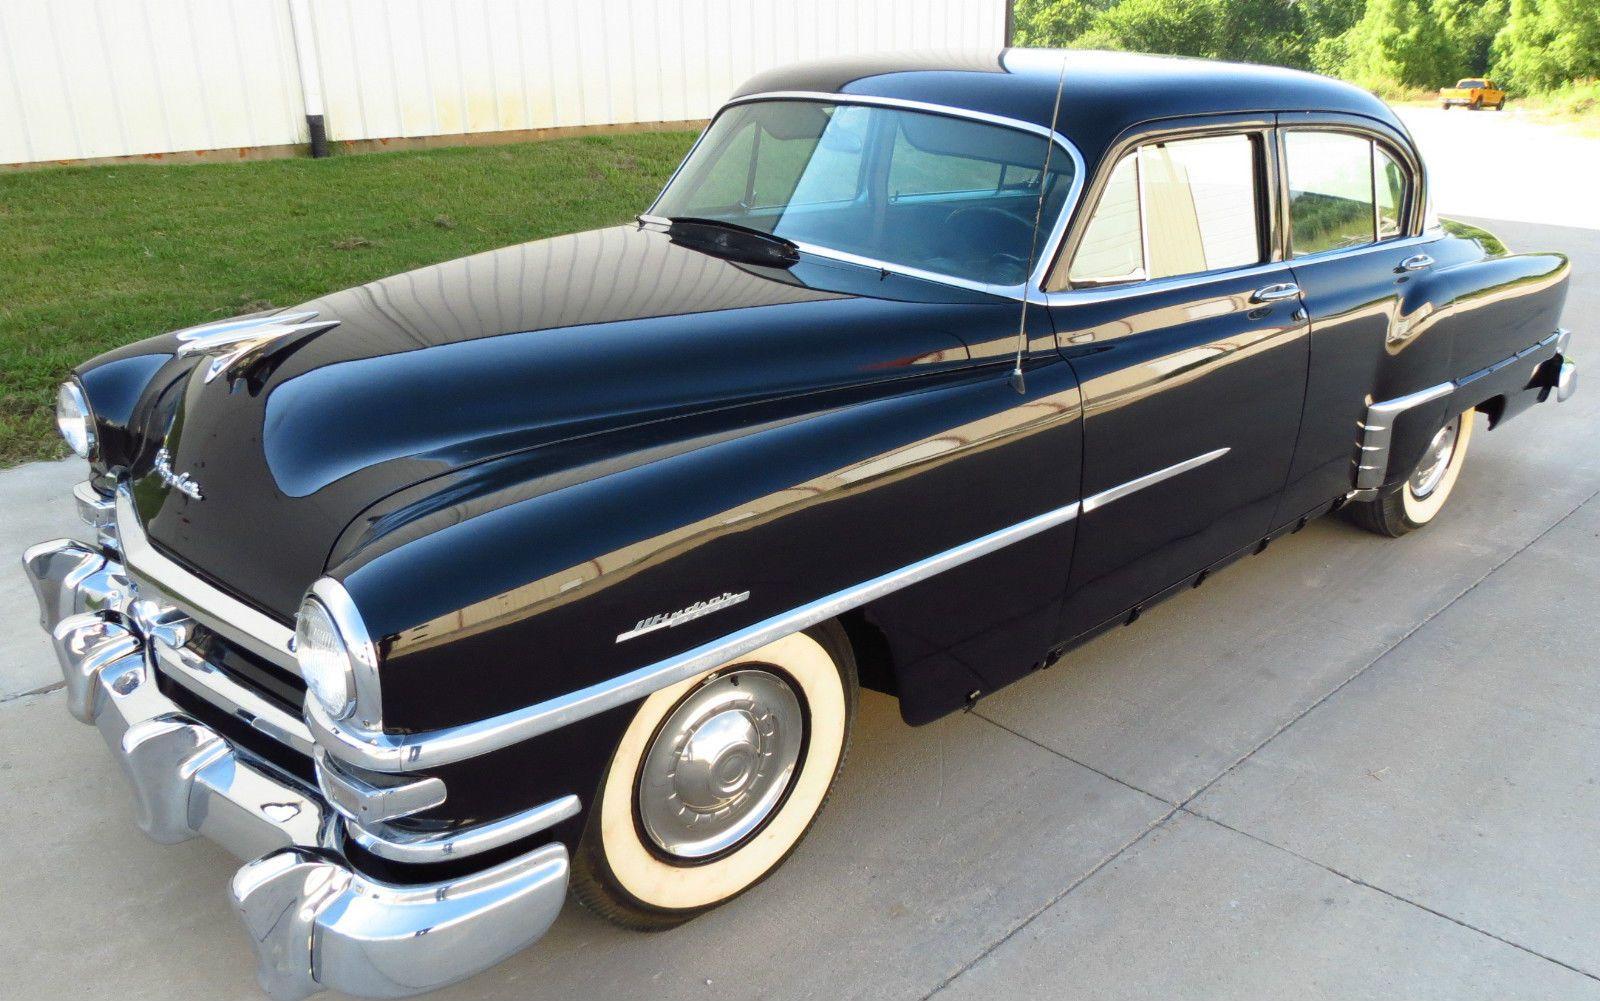 Car Brand Auctioned Chrysler Windsor Deluxe 1953 Car Model